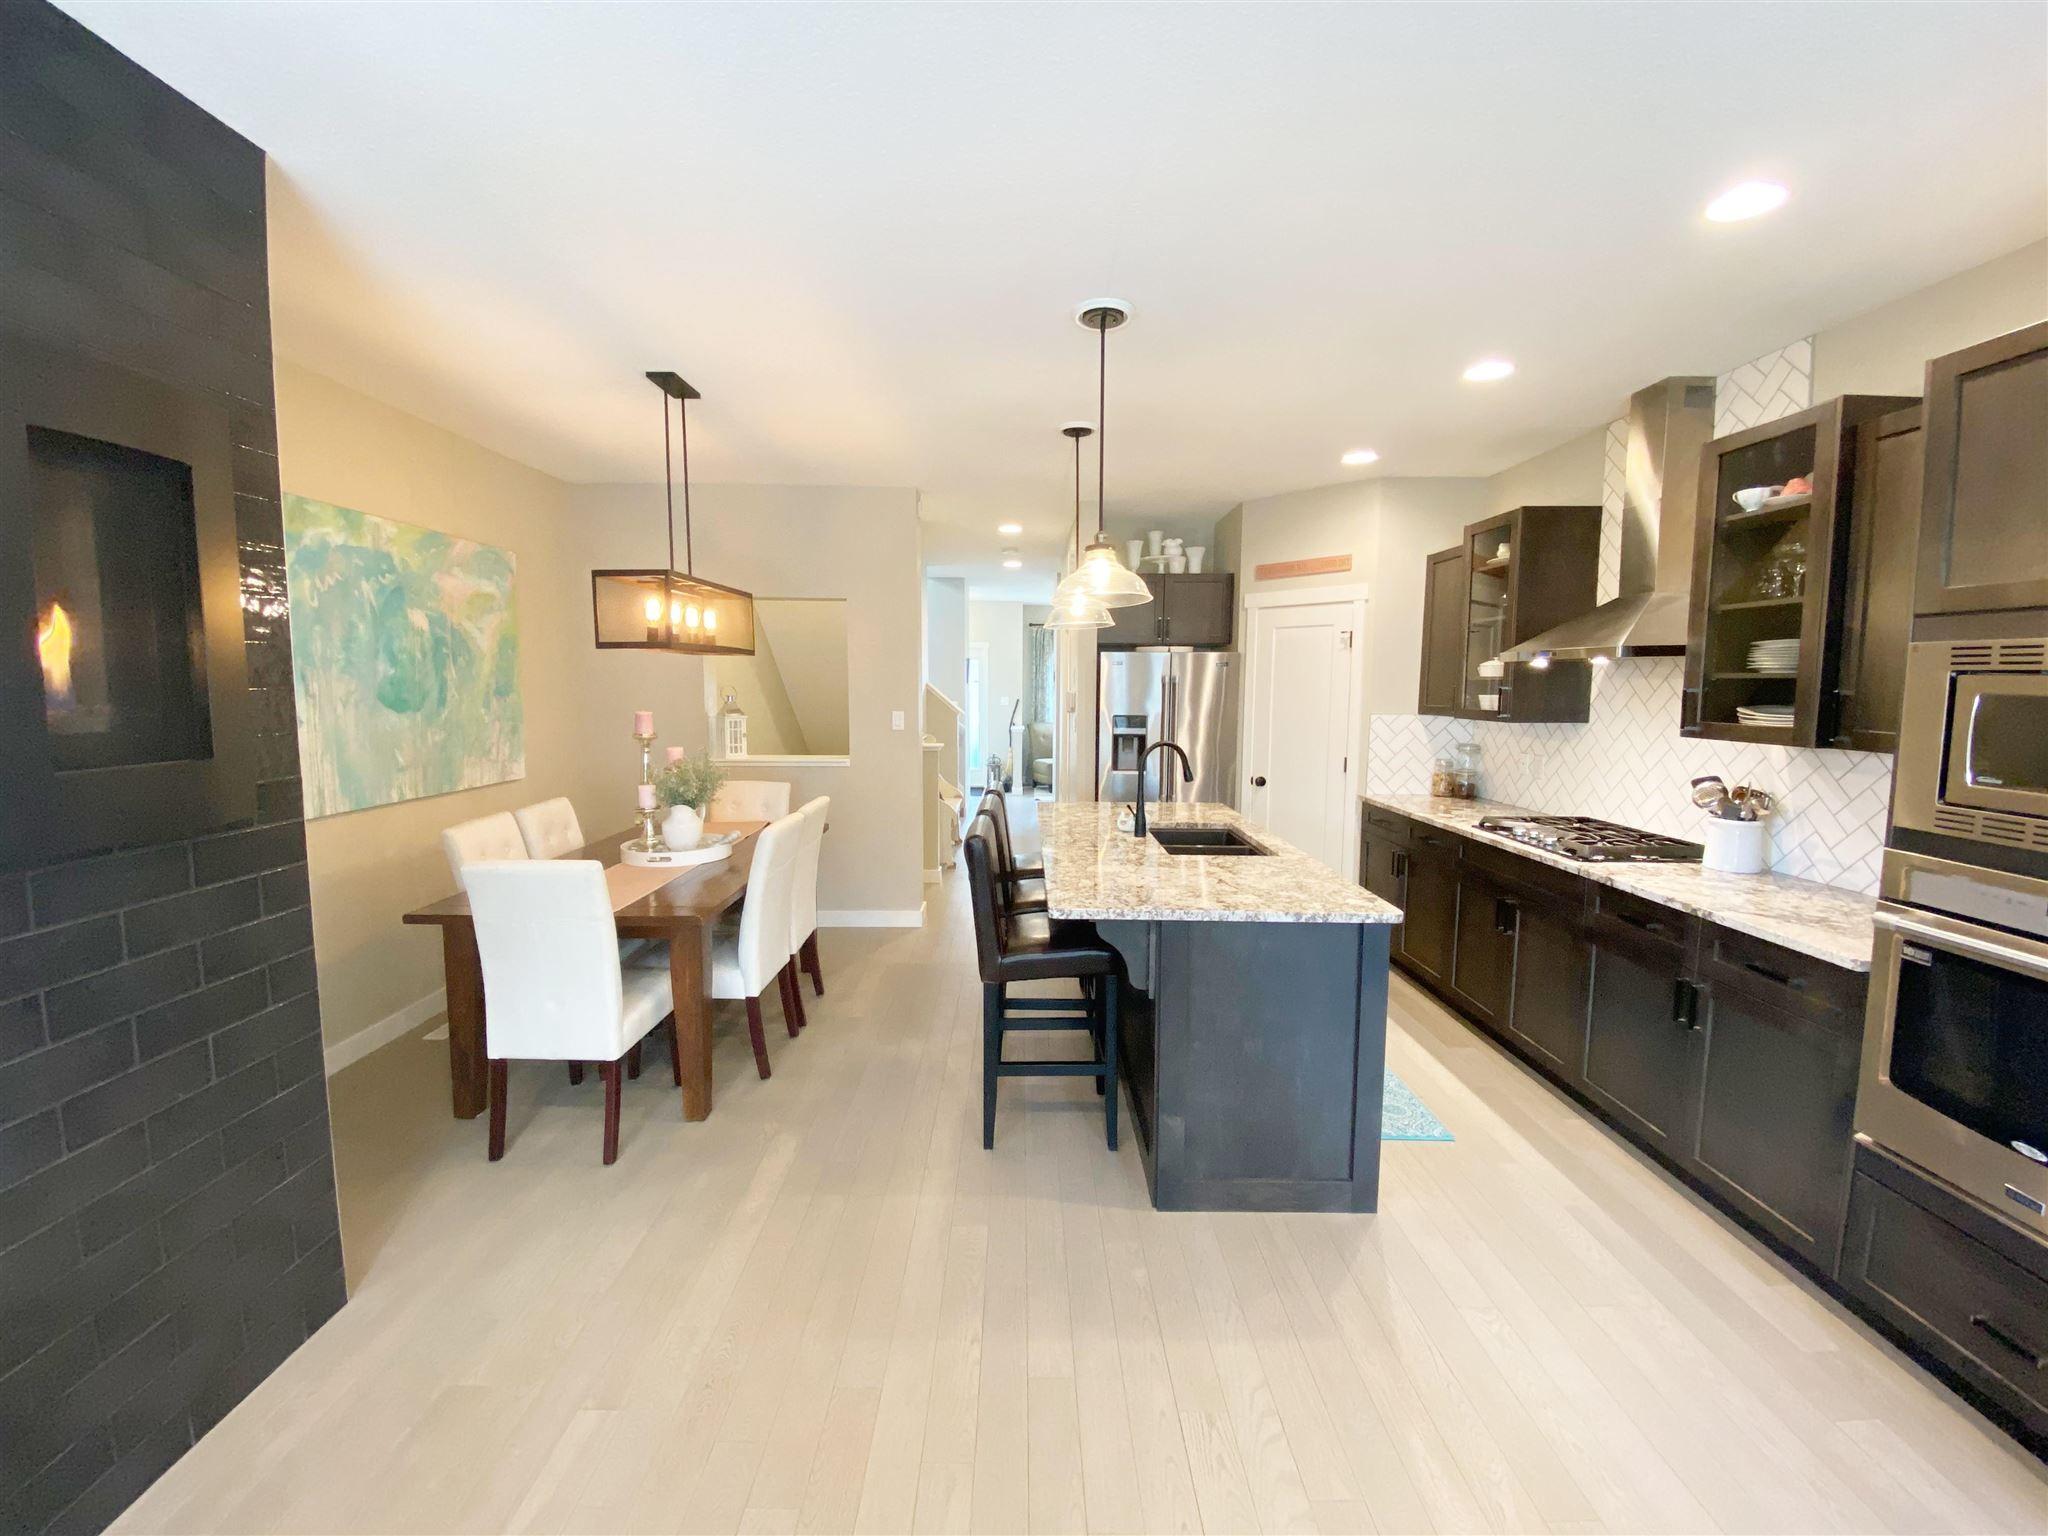 Main Photo: 9349 74 Avenue in Edmonton: Zone 17 House for sale : MLS®# E4246636